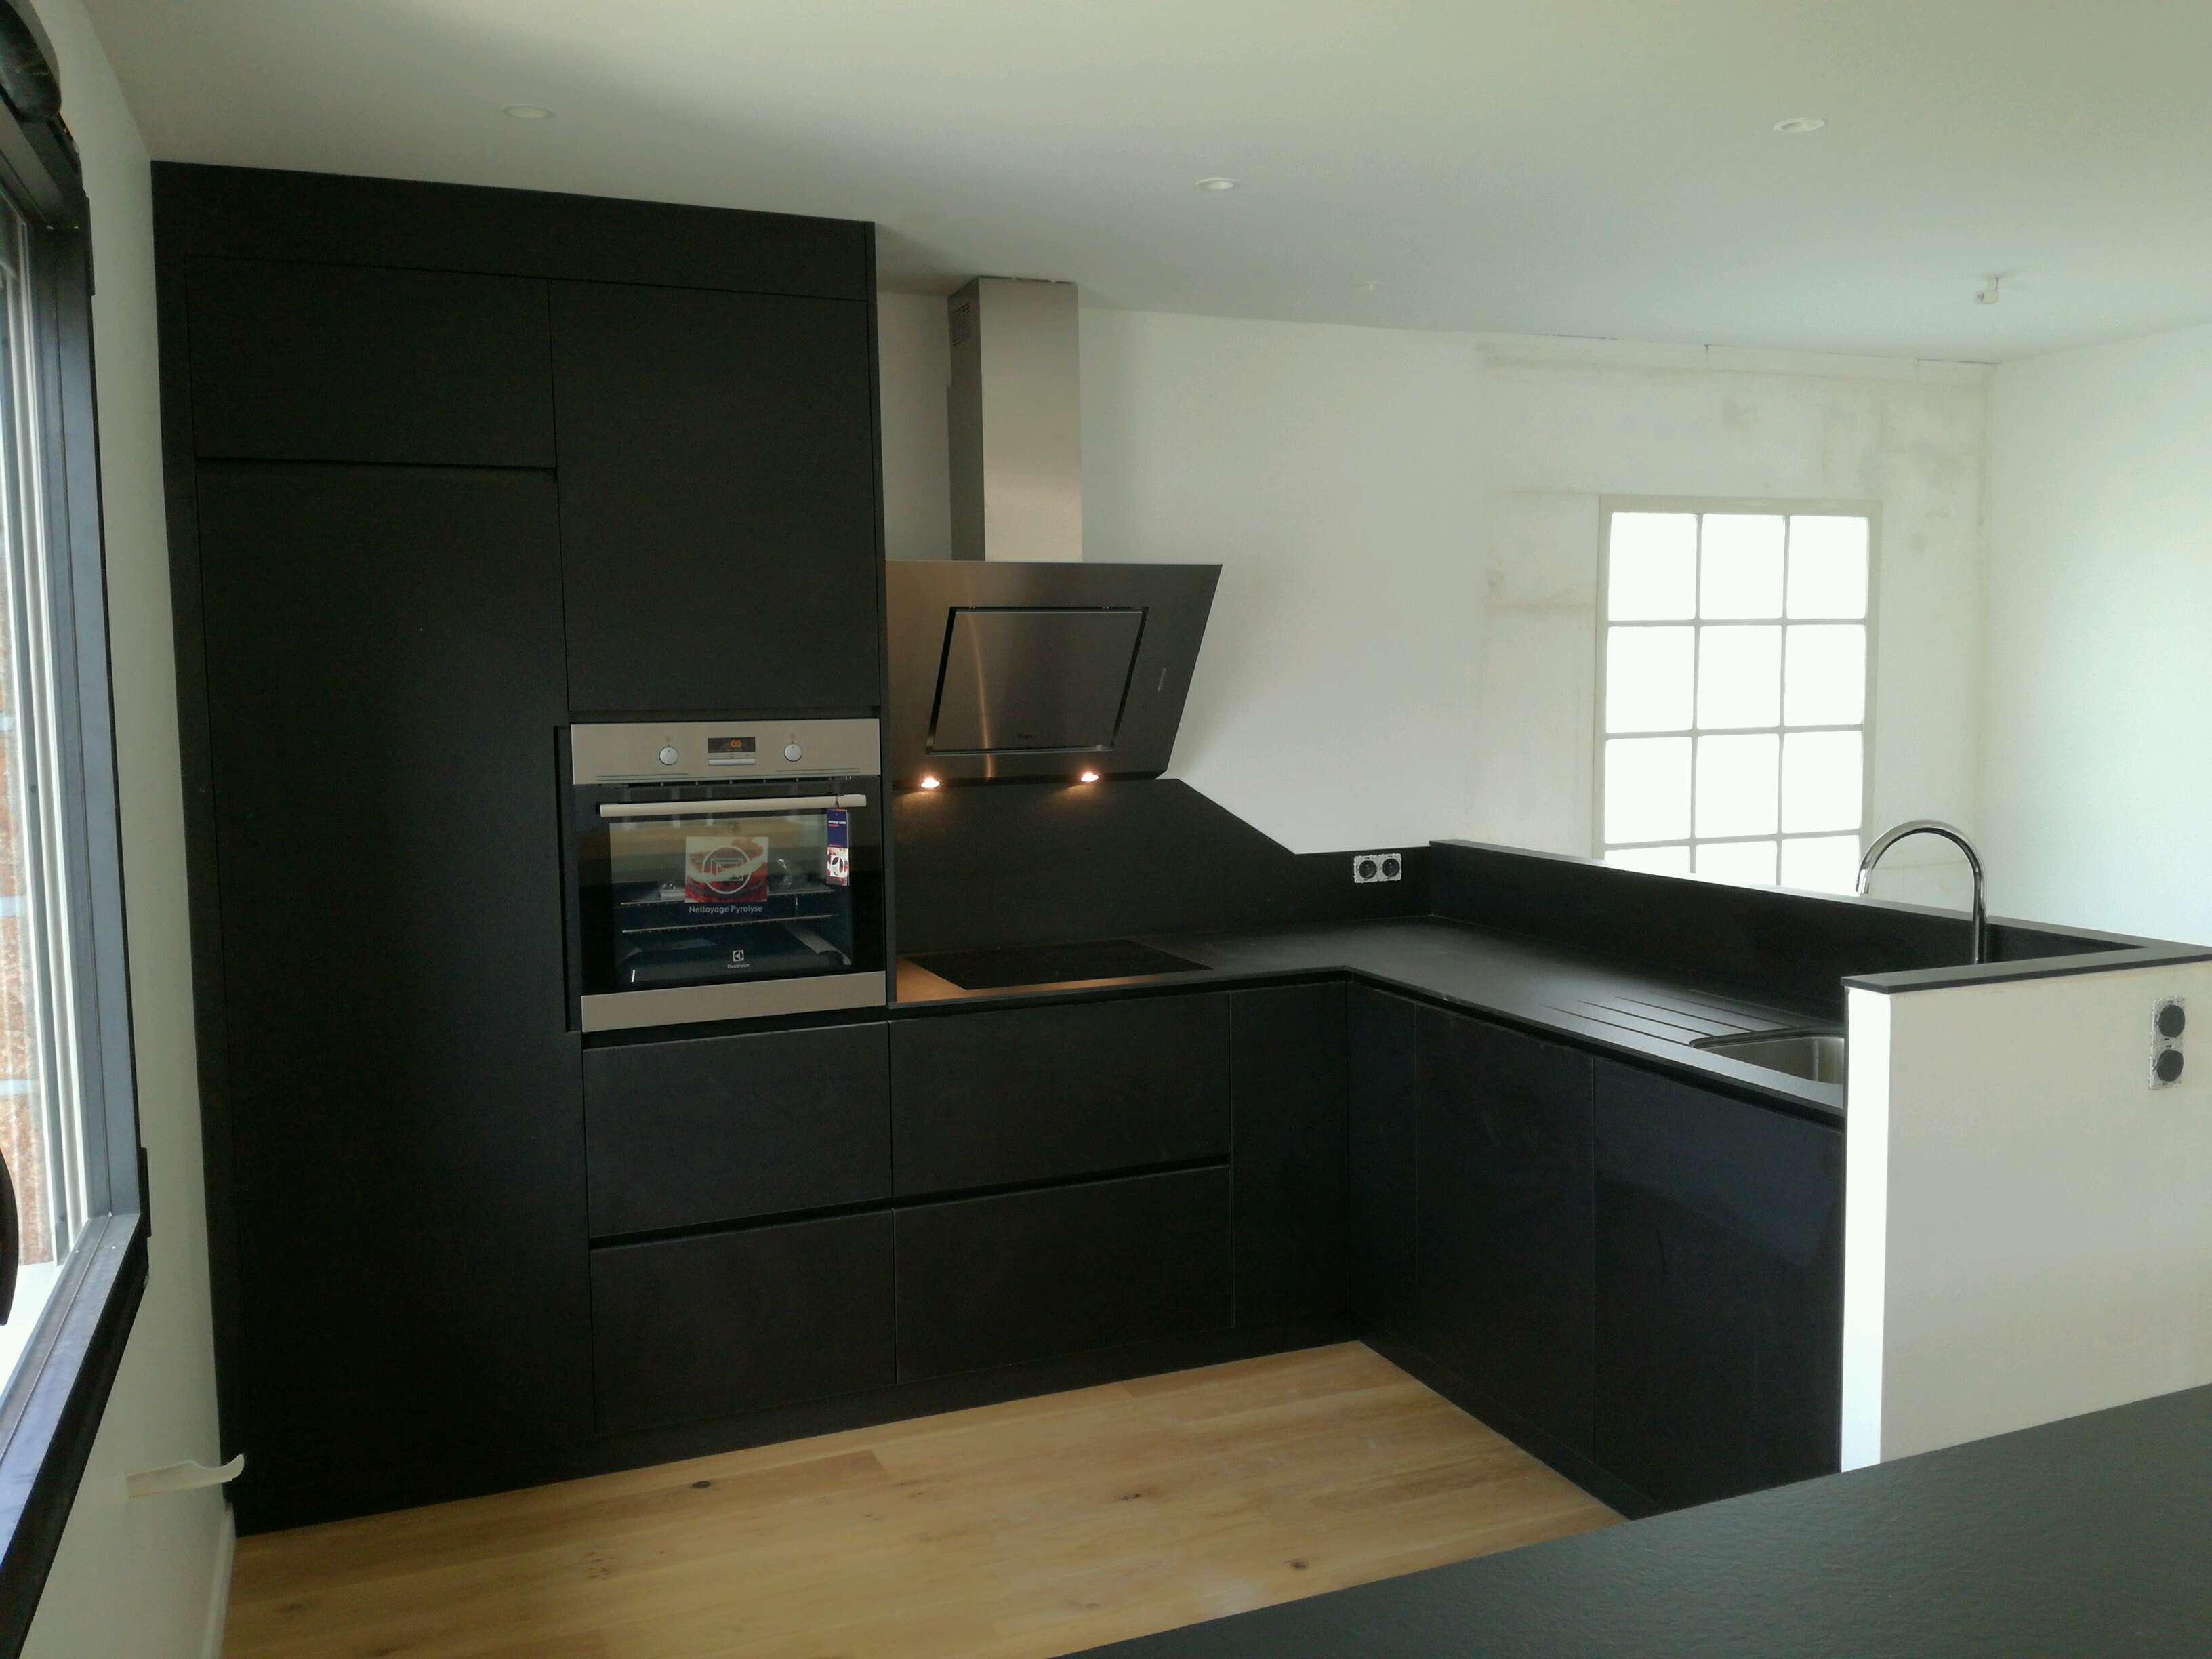 cuisine am nag e fabrication artisanale et pose en mayenne. Black Bedroom Furniture Sets. Home Design Ideas